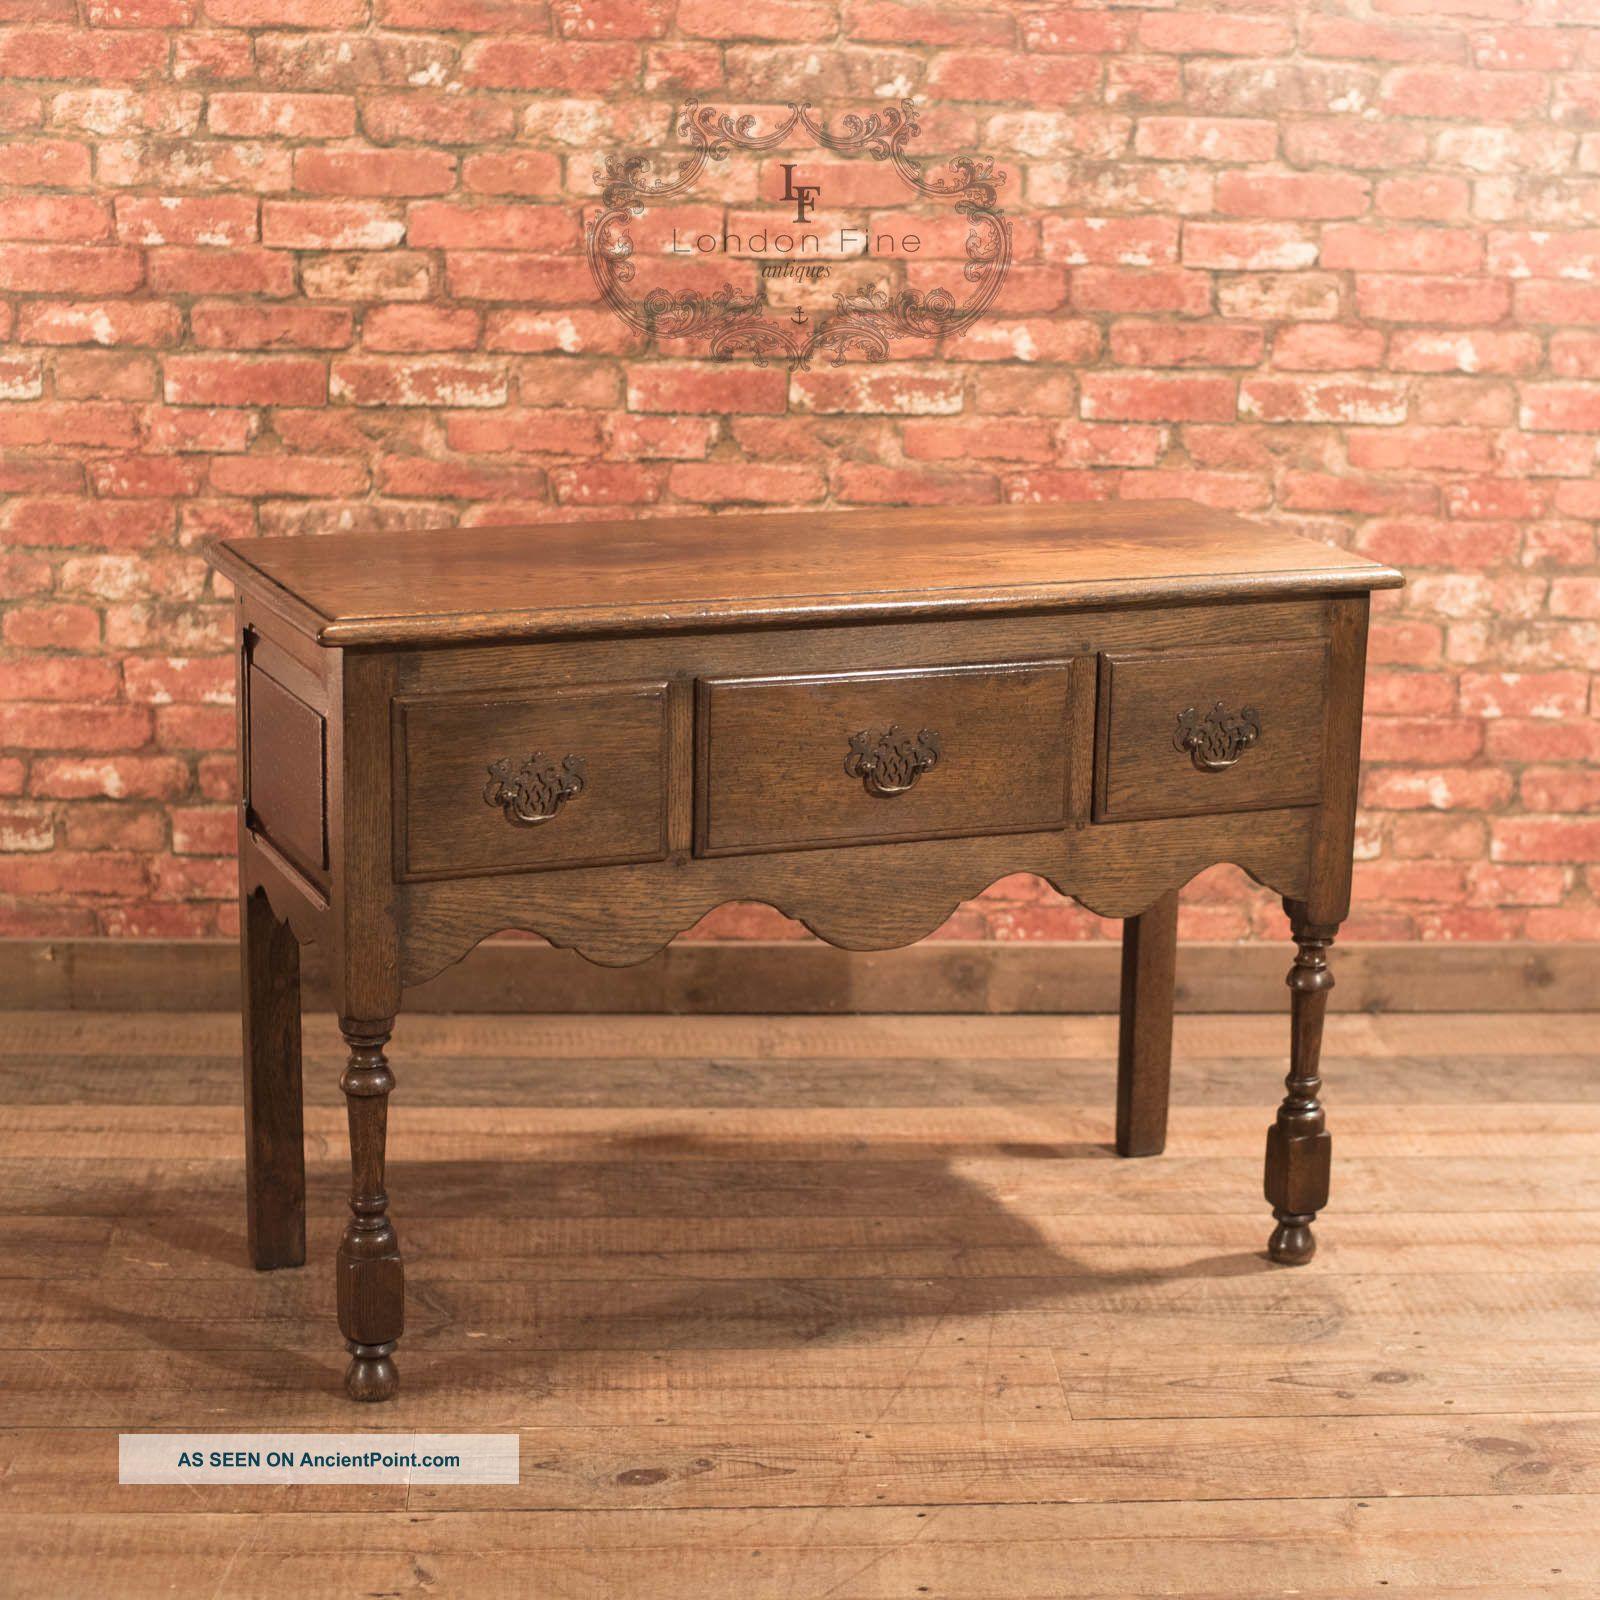 Antique Dresser Base,  Edwardian Lowboy,  Georgian Revival,  English Oak C1910 Edwardian (1901-1910) photo